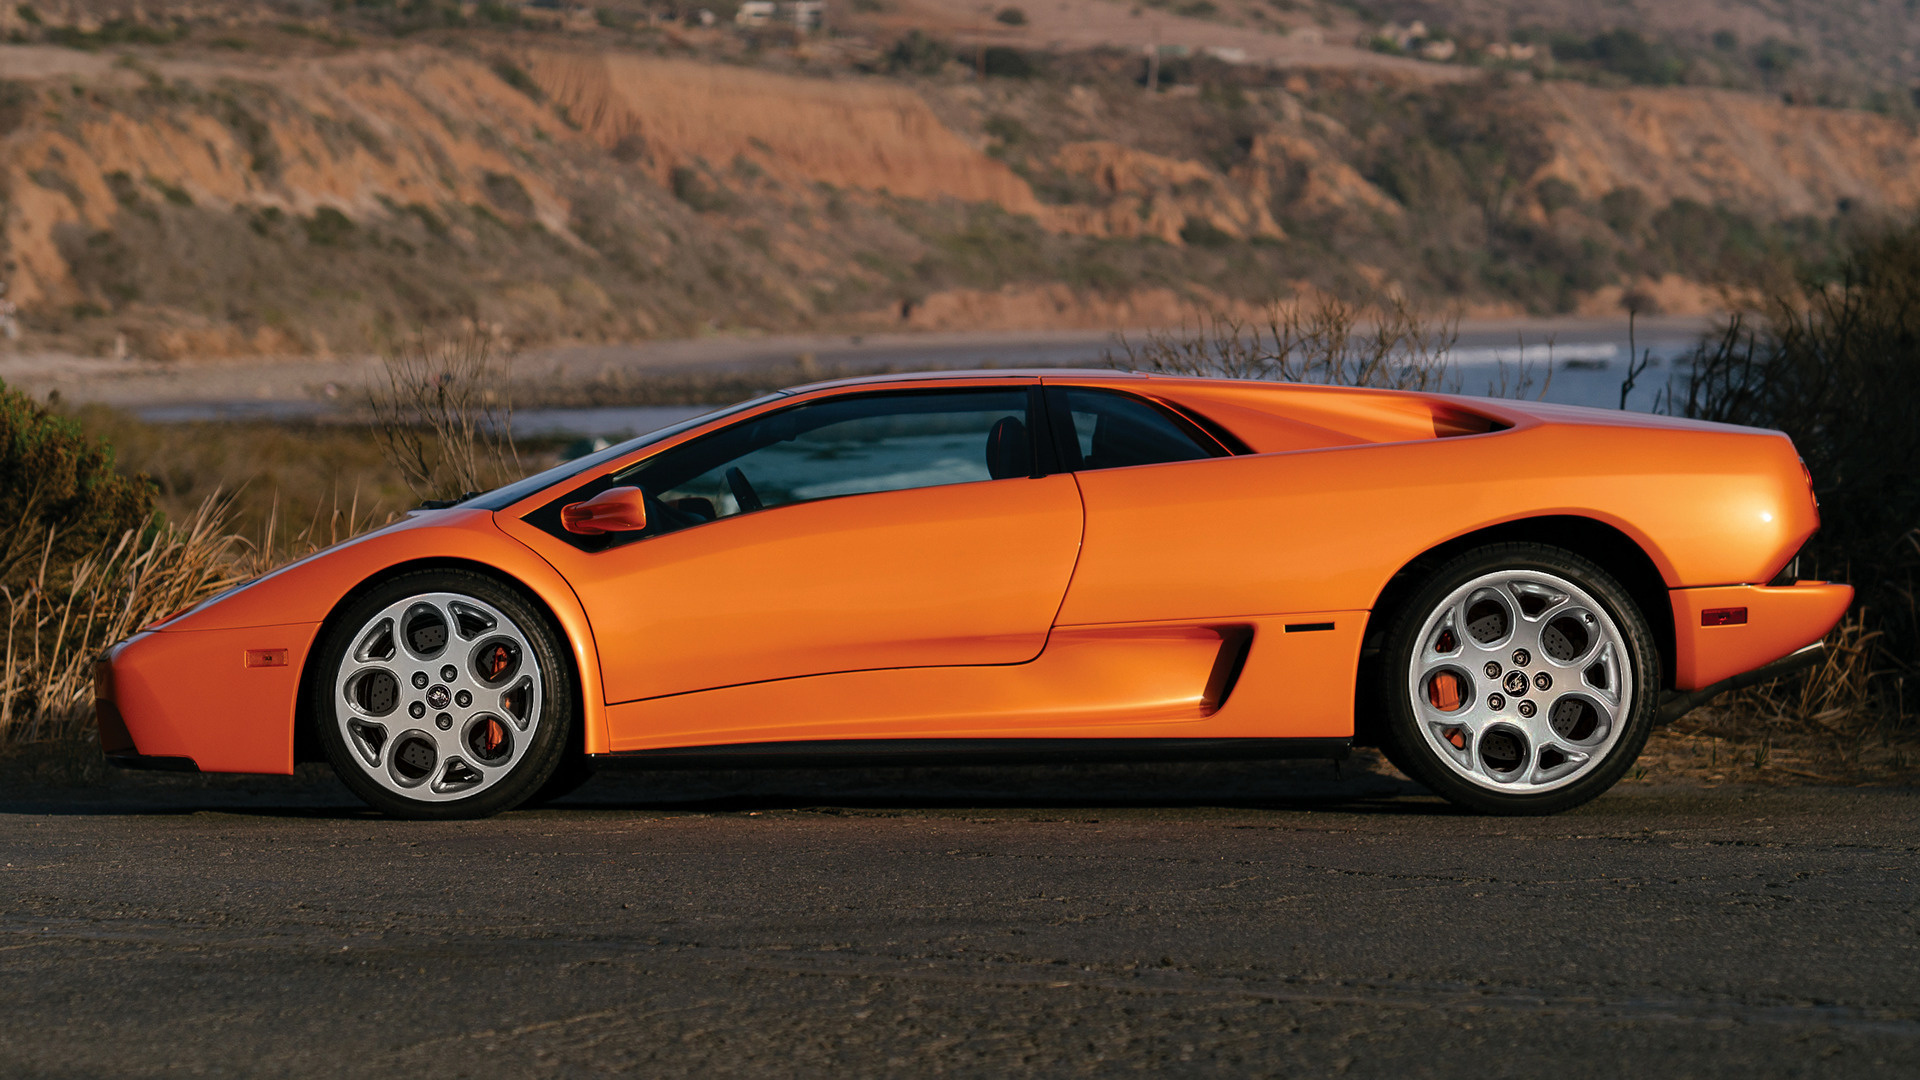 2000 Lamborghini Diablo Vt 6 0 Us Wallpapers And Hd